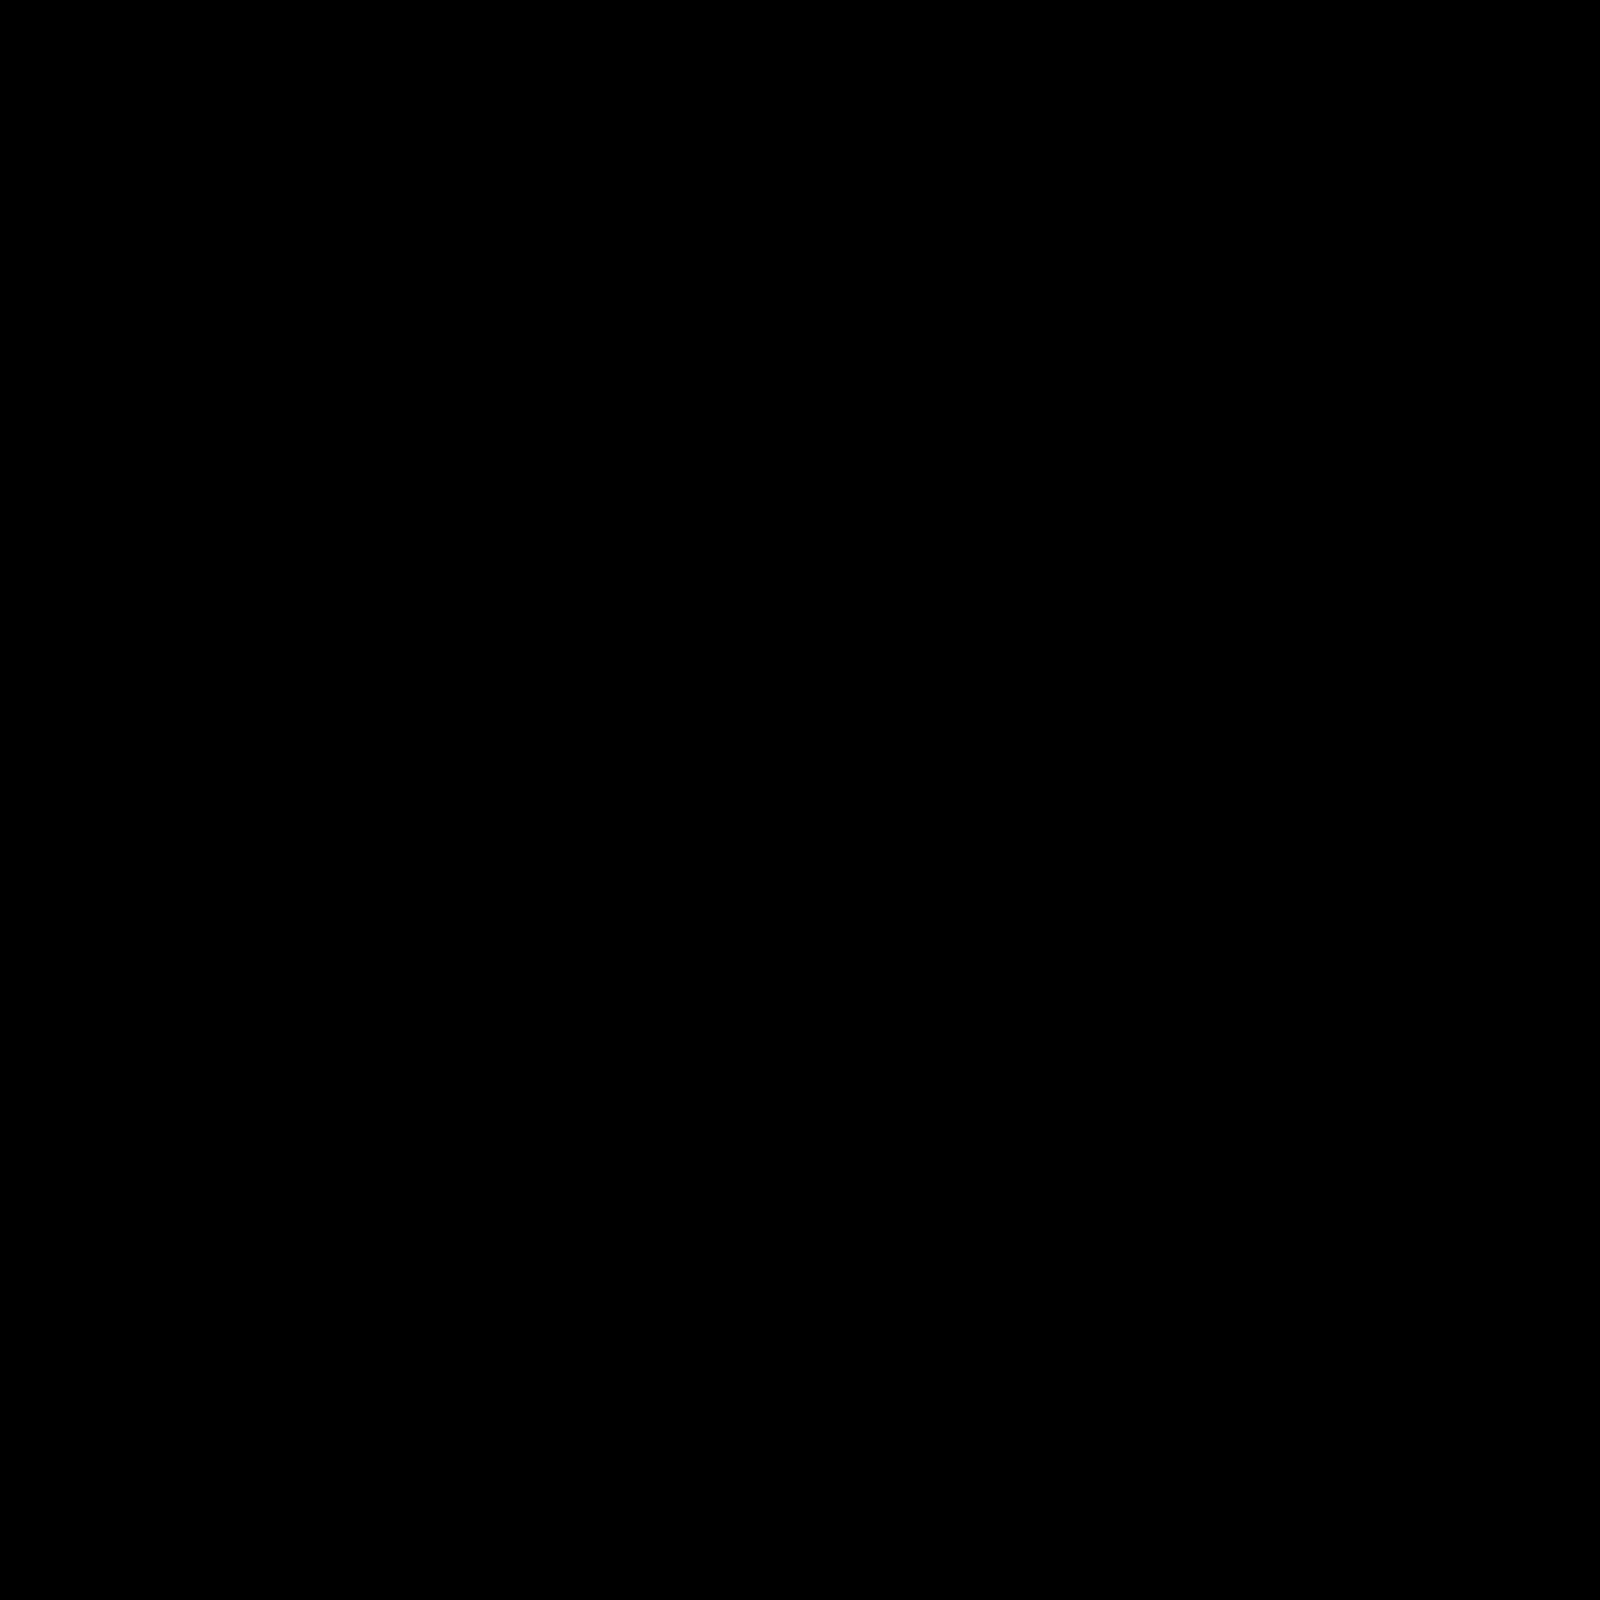 cv yann